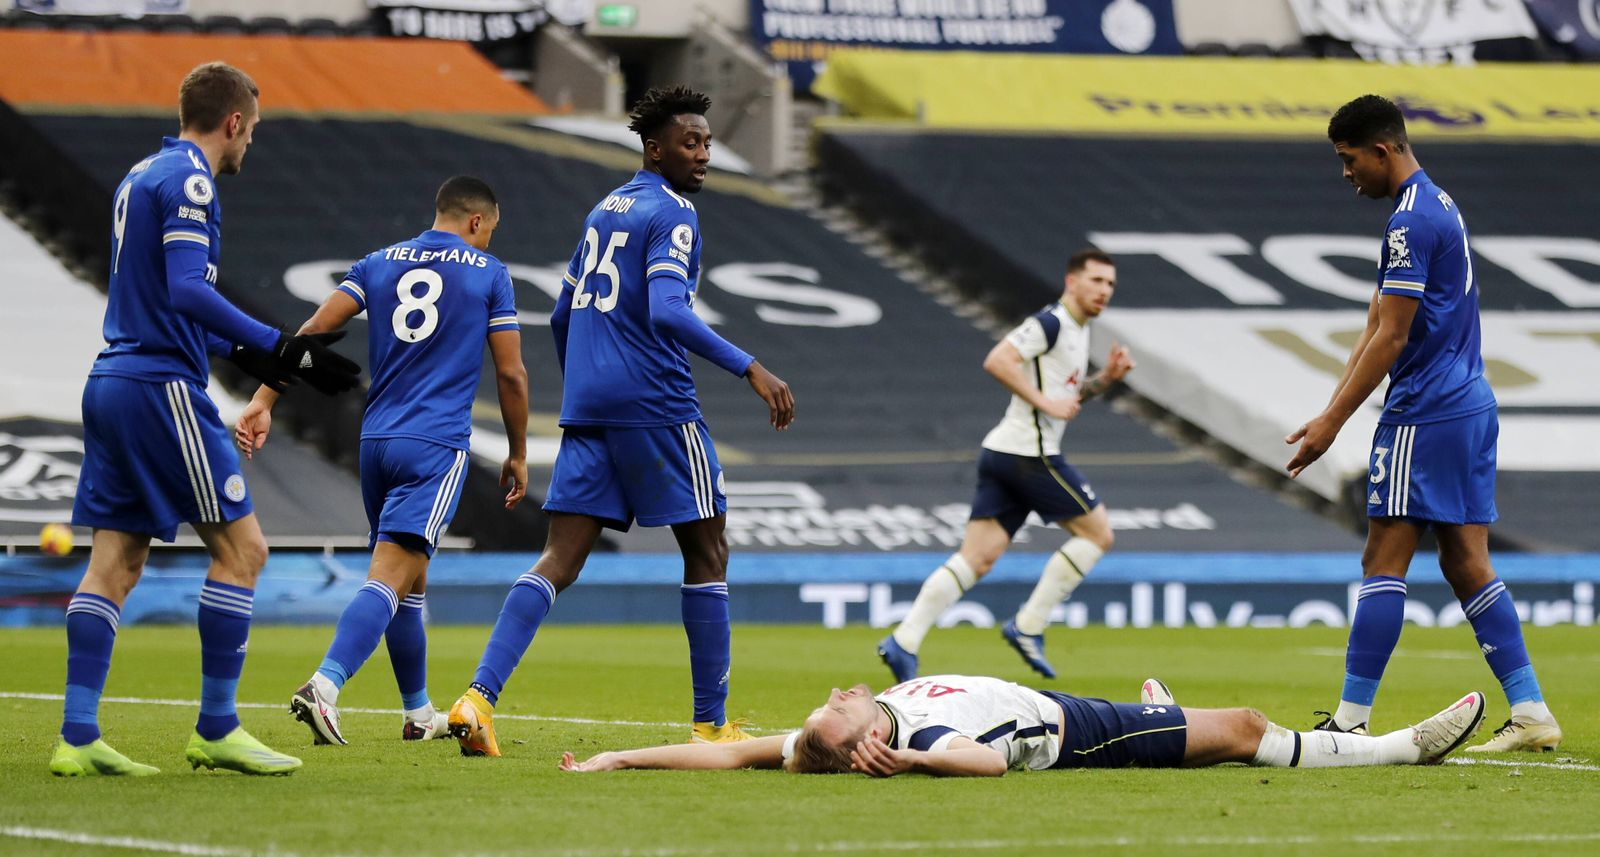 Tottenham Hotspur v Leicester City - Premier League - Tottenham Hotspur Stadium Tottenham Hotspur s Harry Kane reacts a